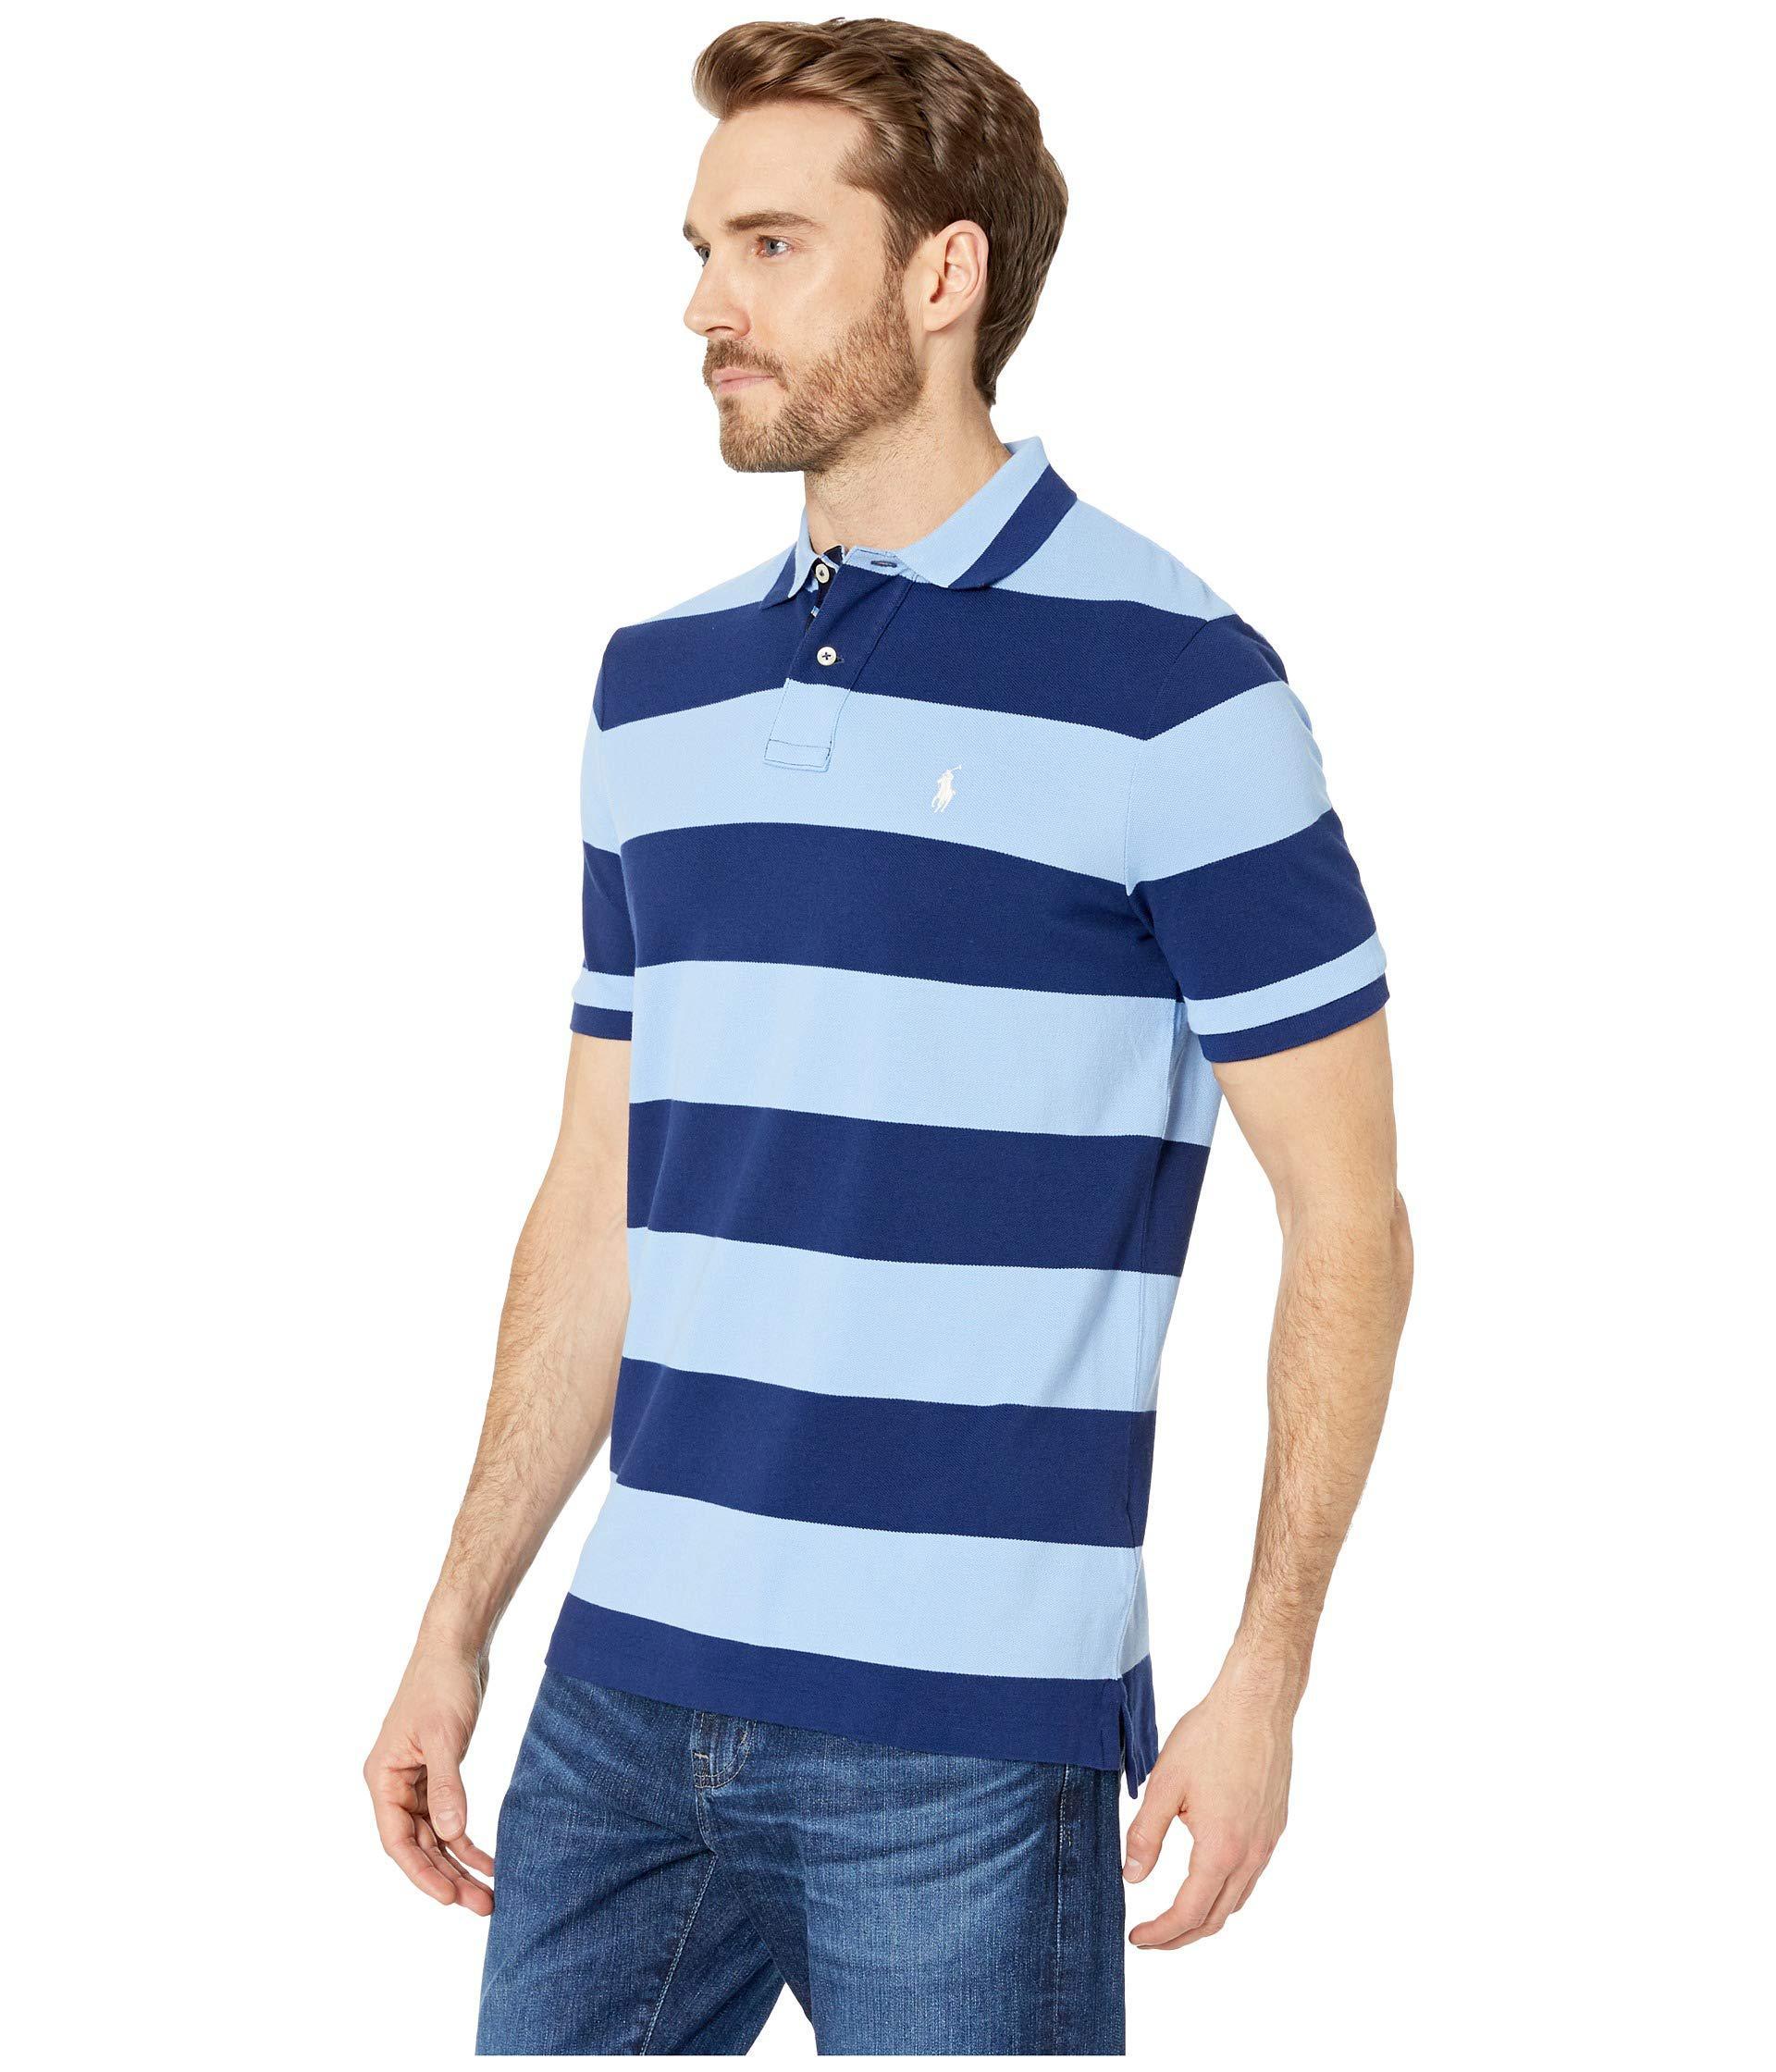 e19fafdb Lyst - Polo Ralph Lauren Yarn-dyed Mesh Short Sleeve Knit (cruise  Royal/white) Men's Clothing in Blue for Men